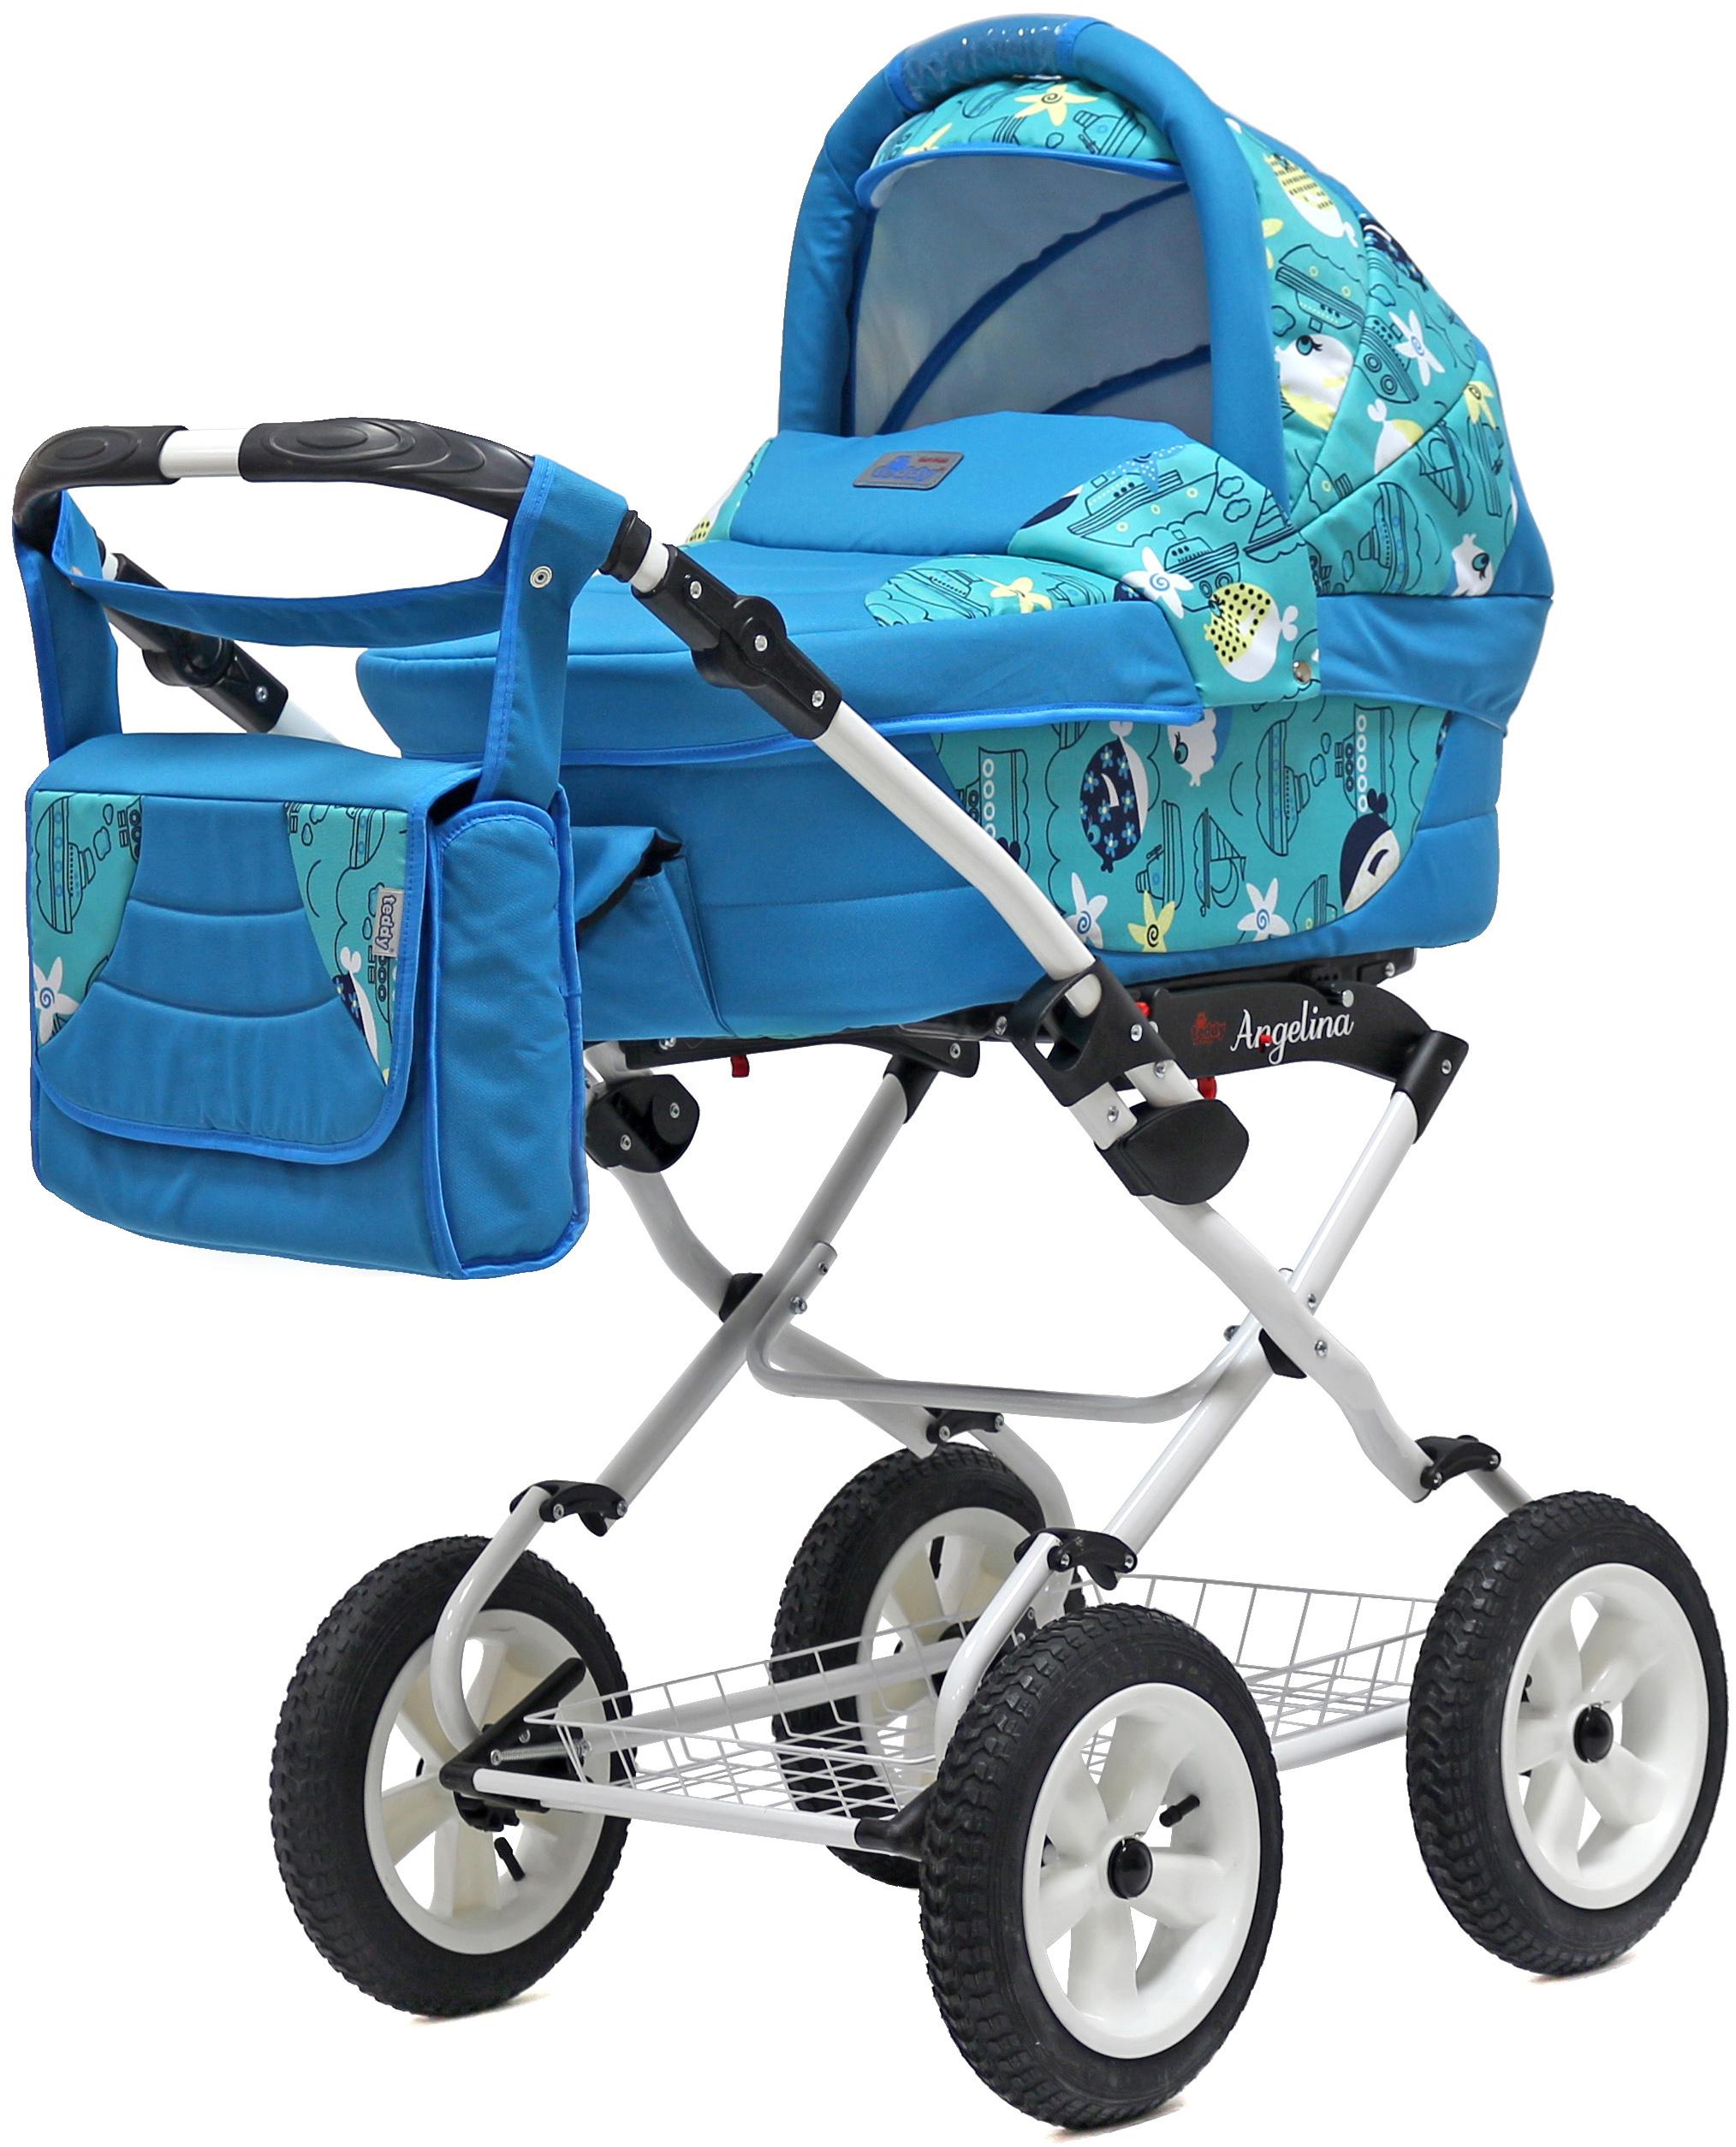 Детские коляски BartPlast Teddy Angelina Lite PKL коляска прогулочная teddy bartplast diana 2016 pkl ro02 бежевый